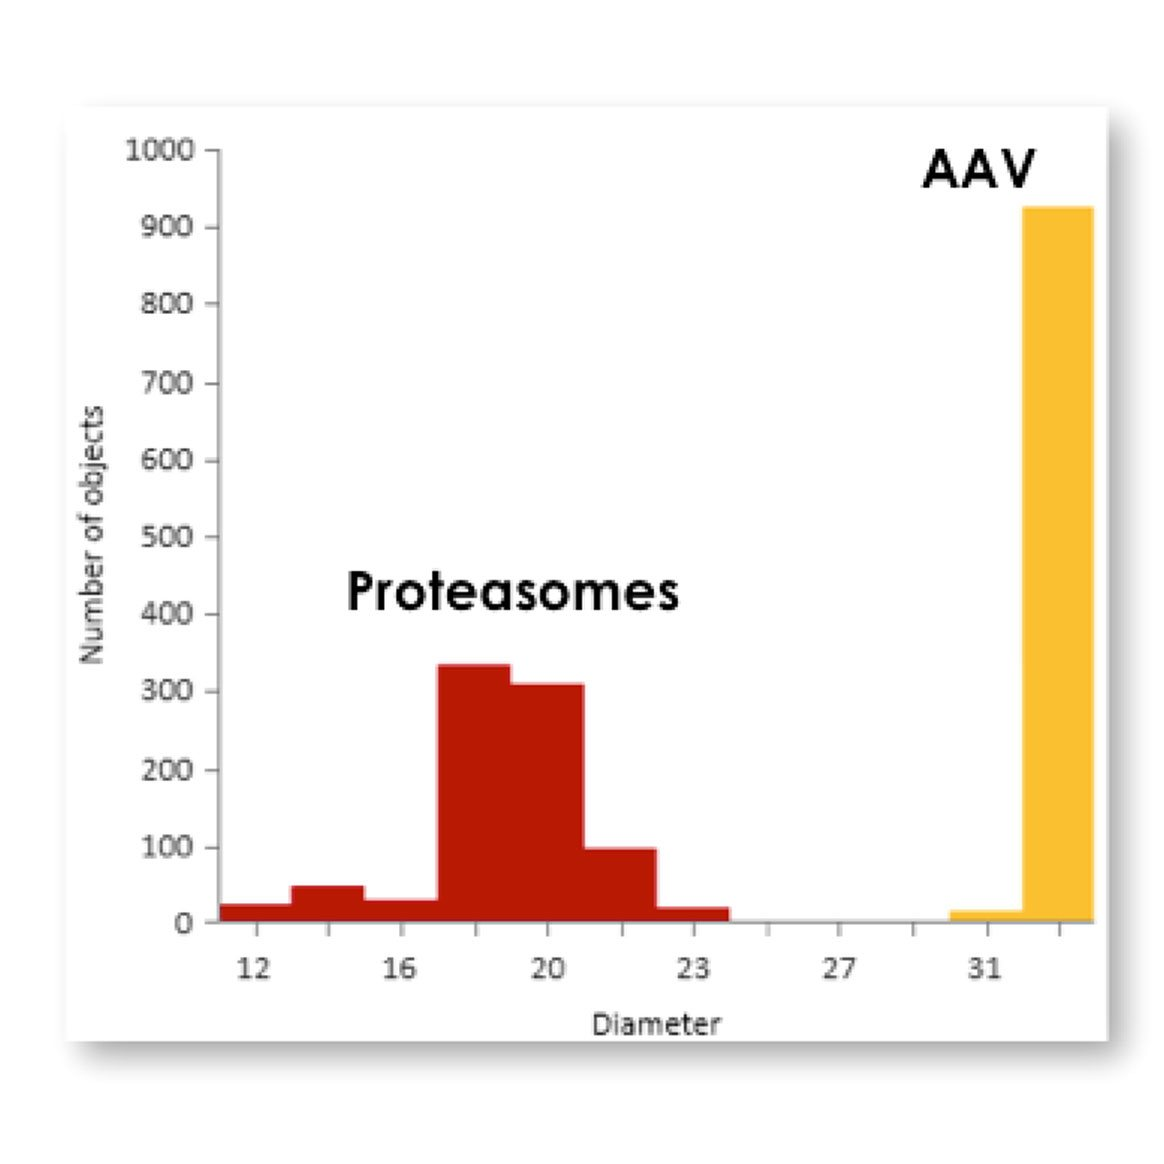 Size distribution analysis